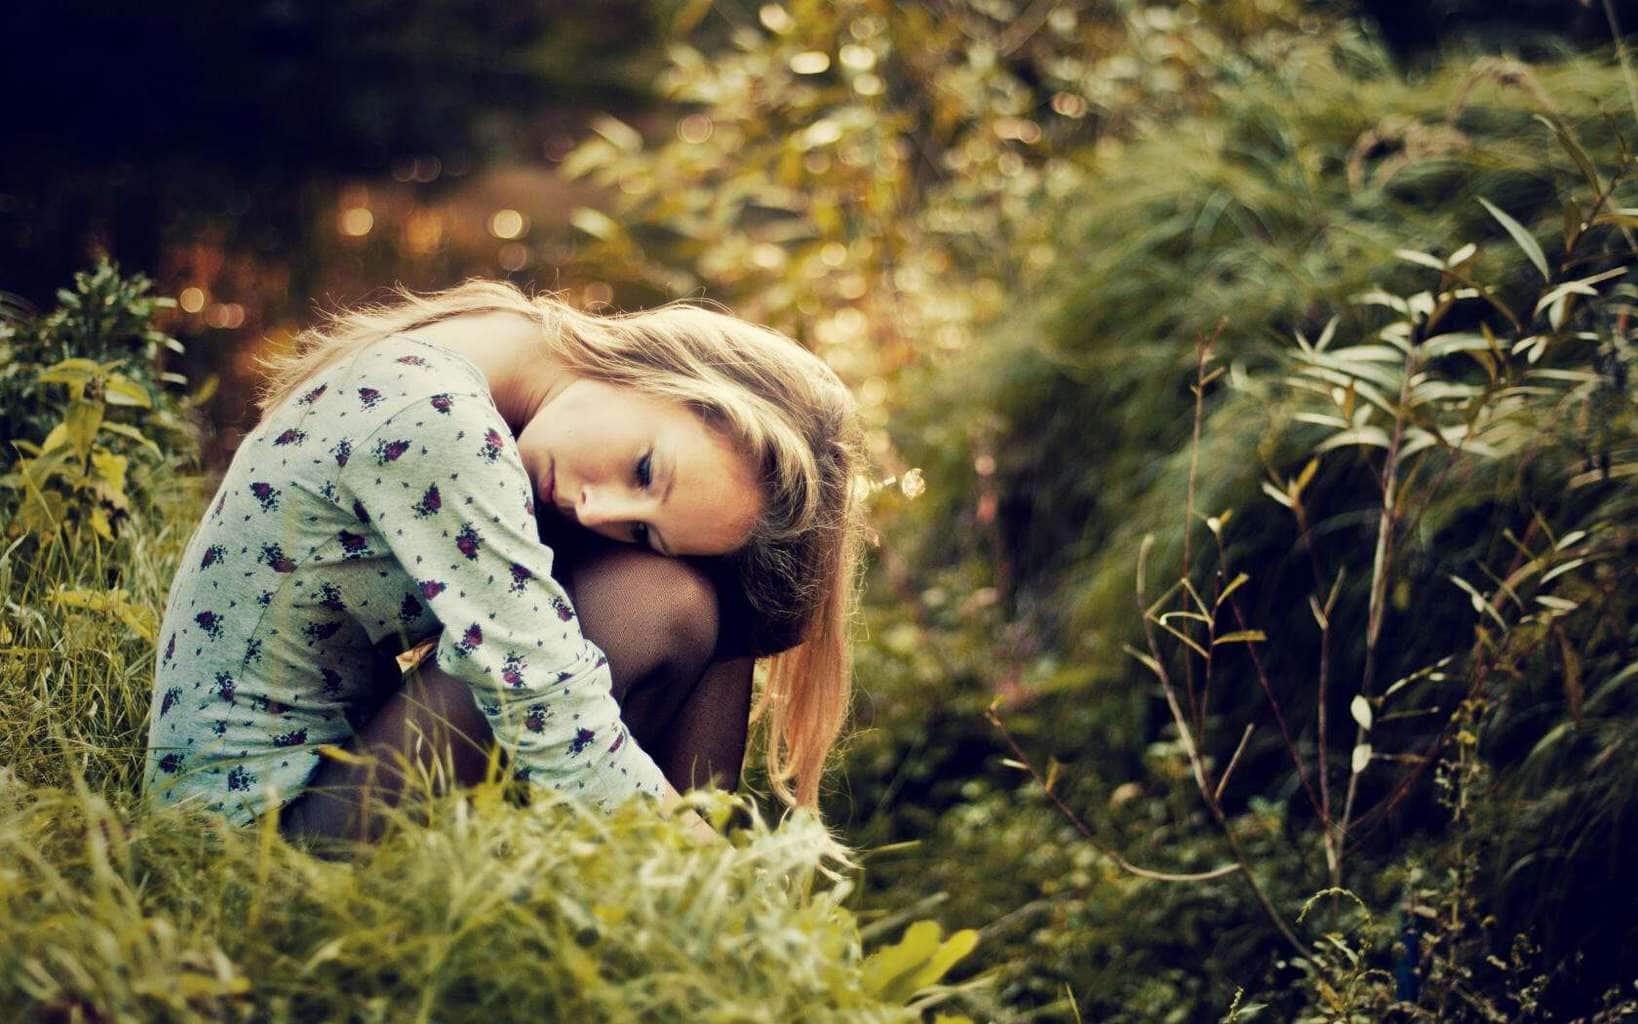 wallpaper-hd-sad-girl-sitting-over-green-grass-sadness-lovesove